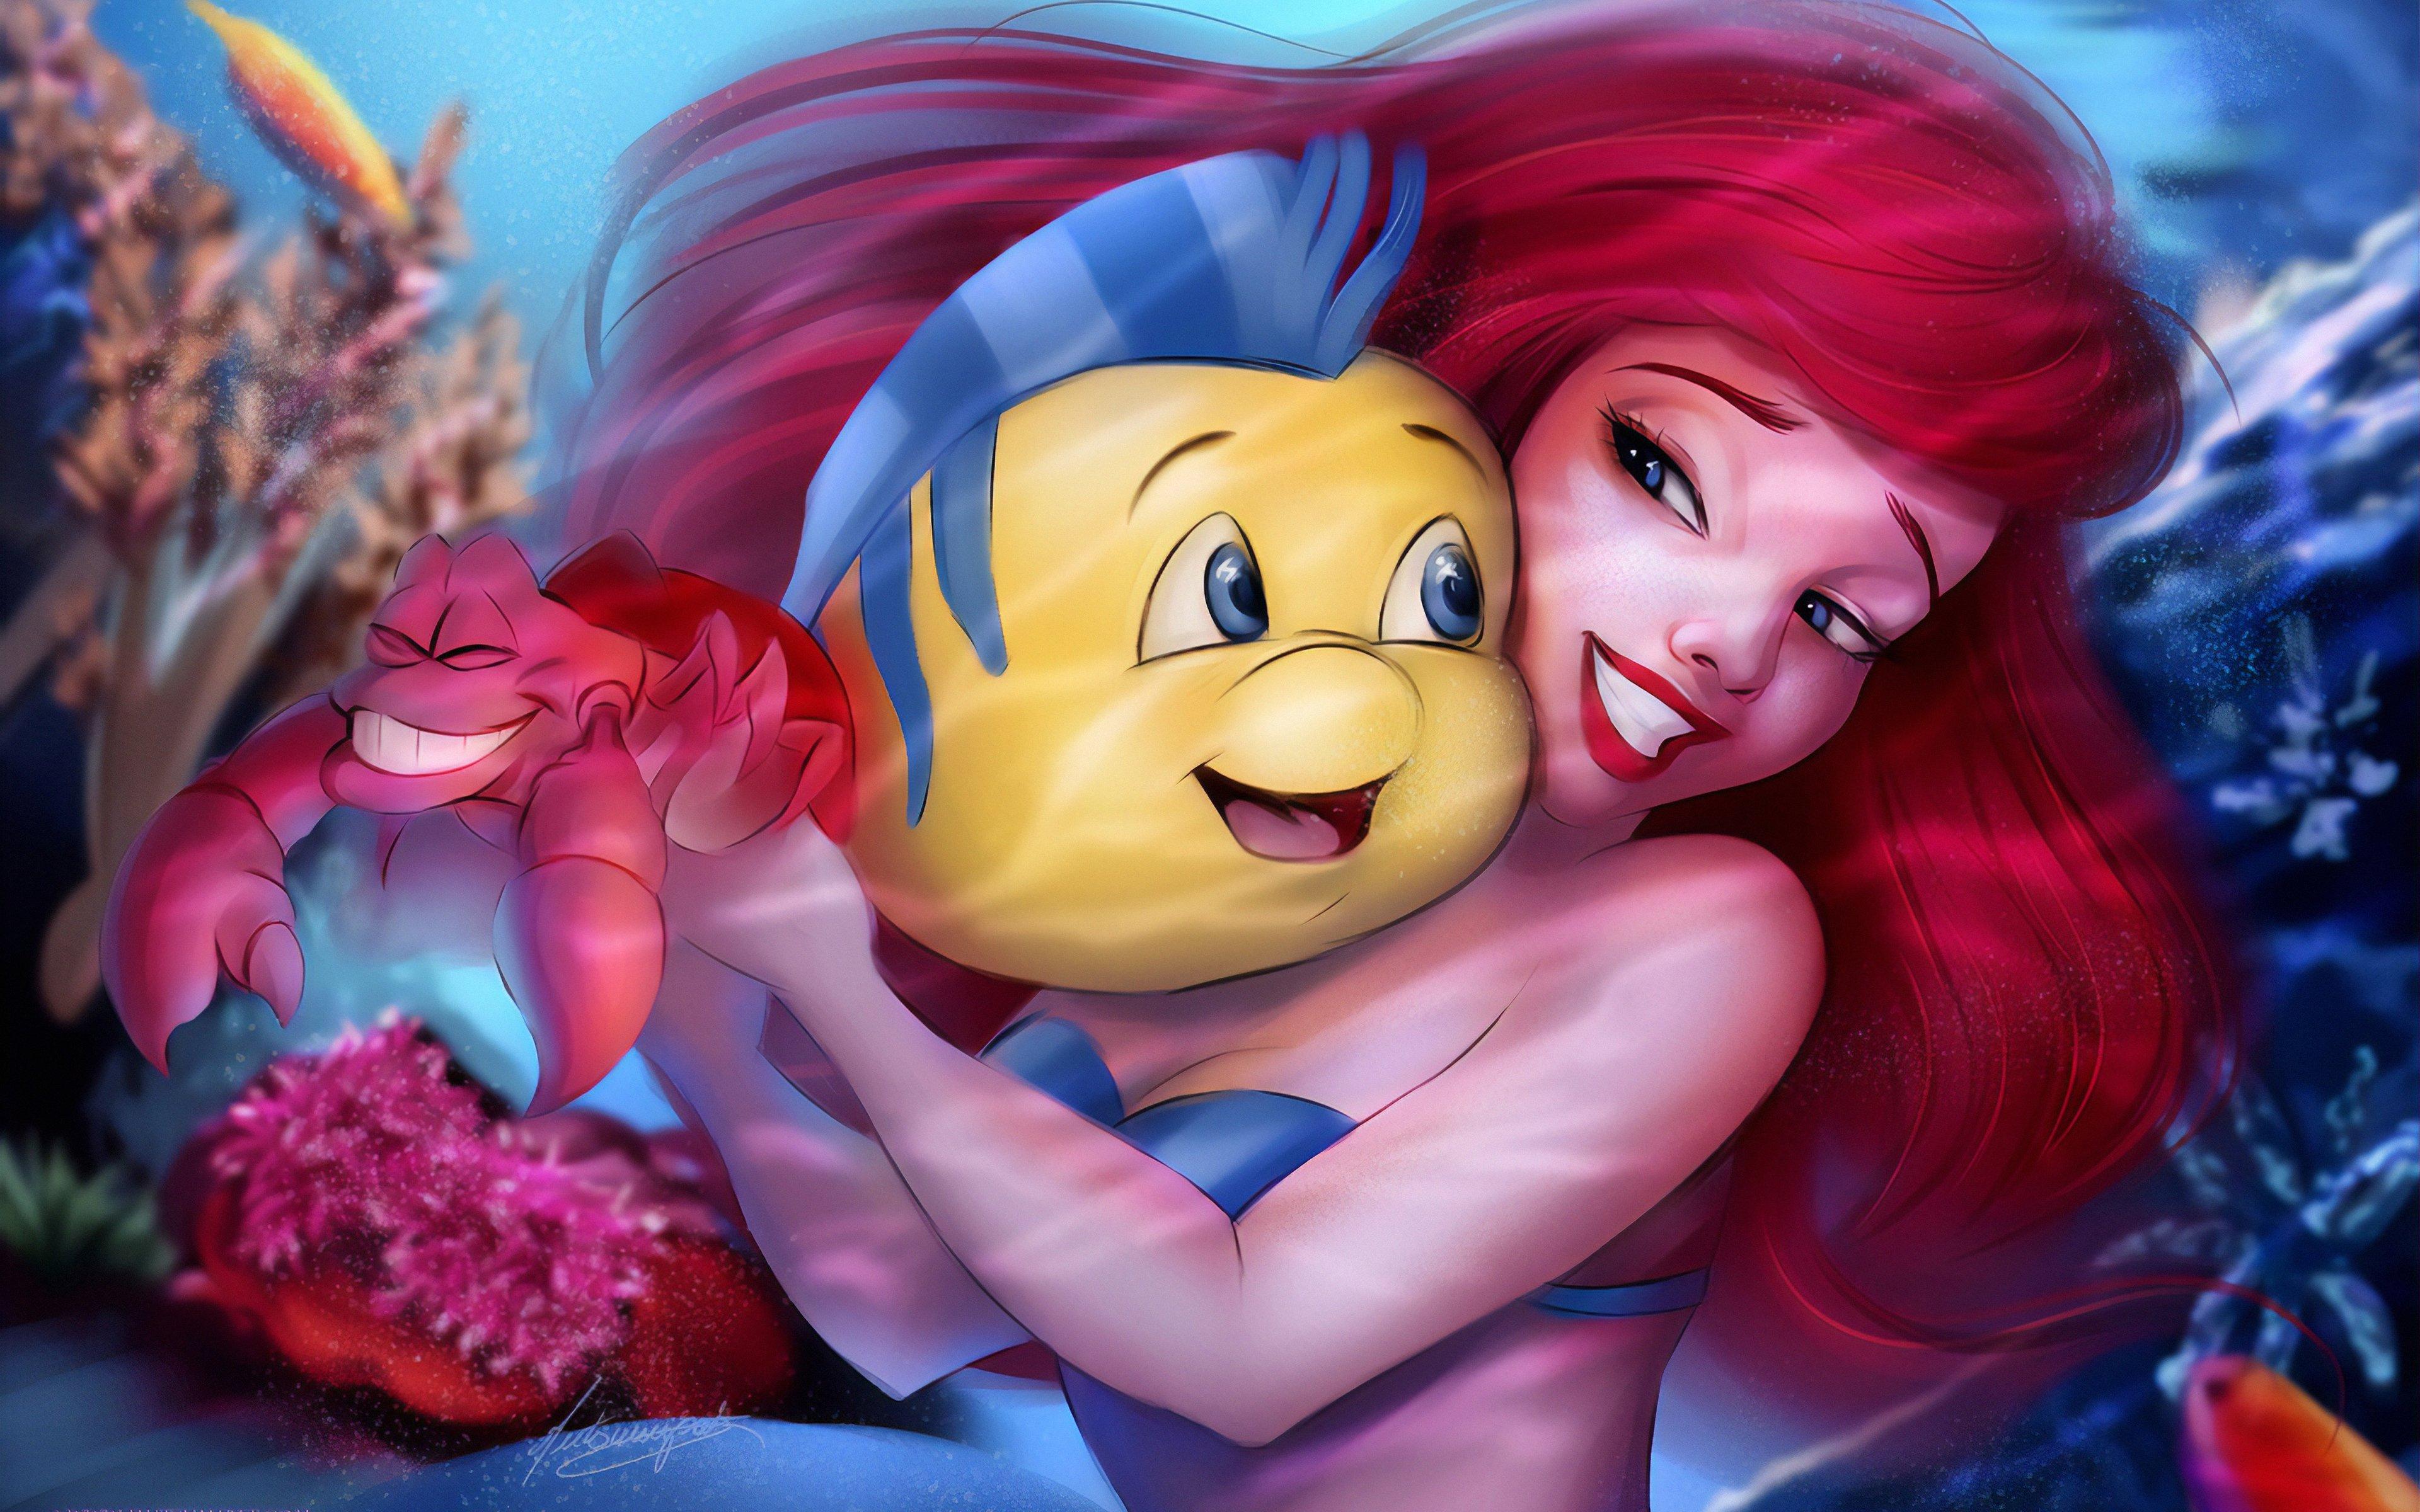 Fondos de pantalla La Sirenita con Flounder